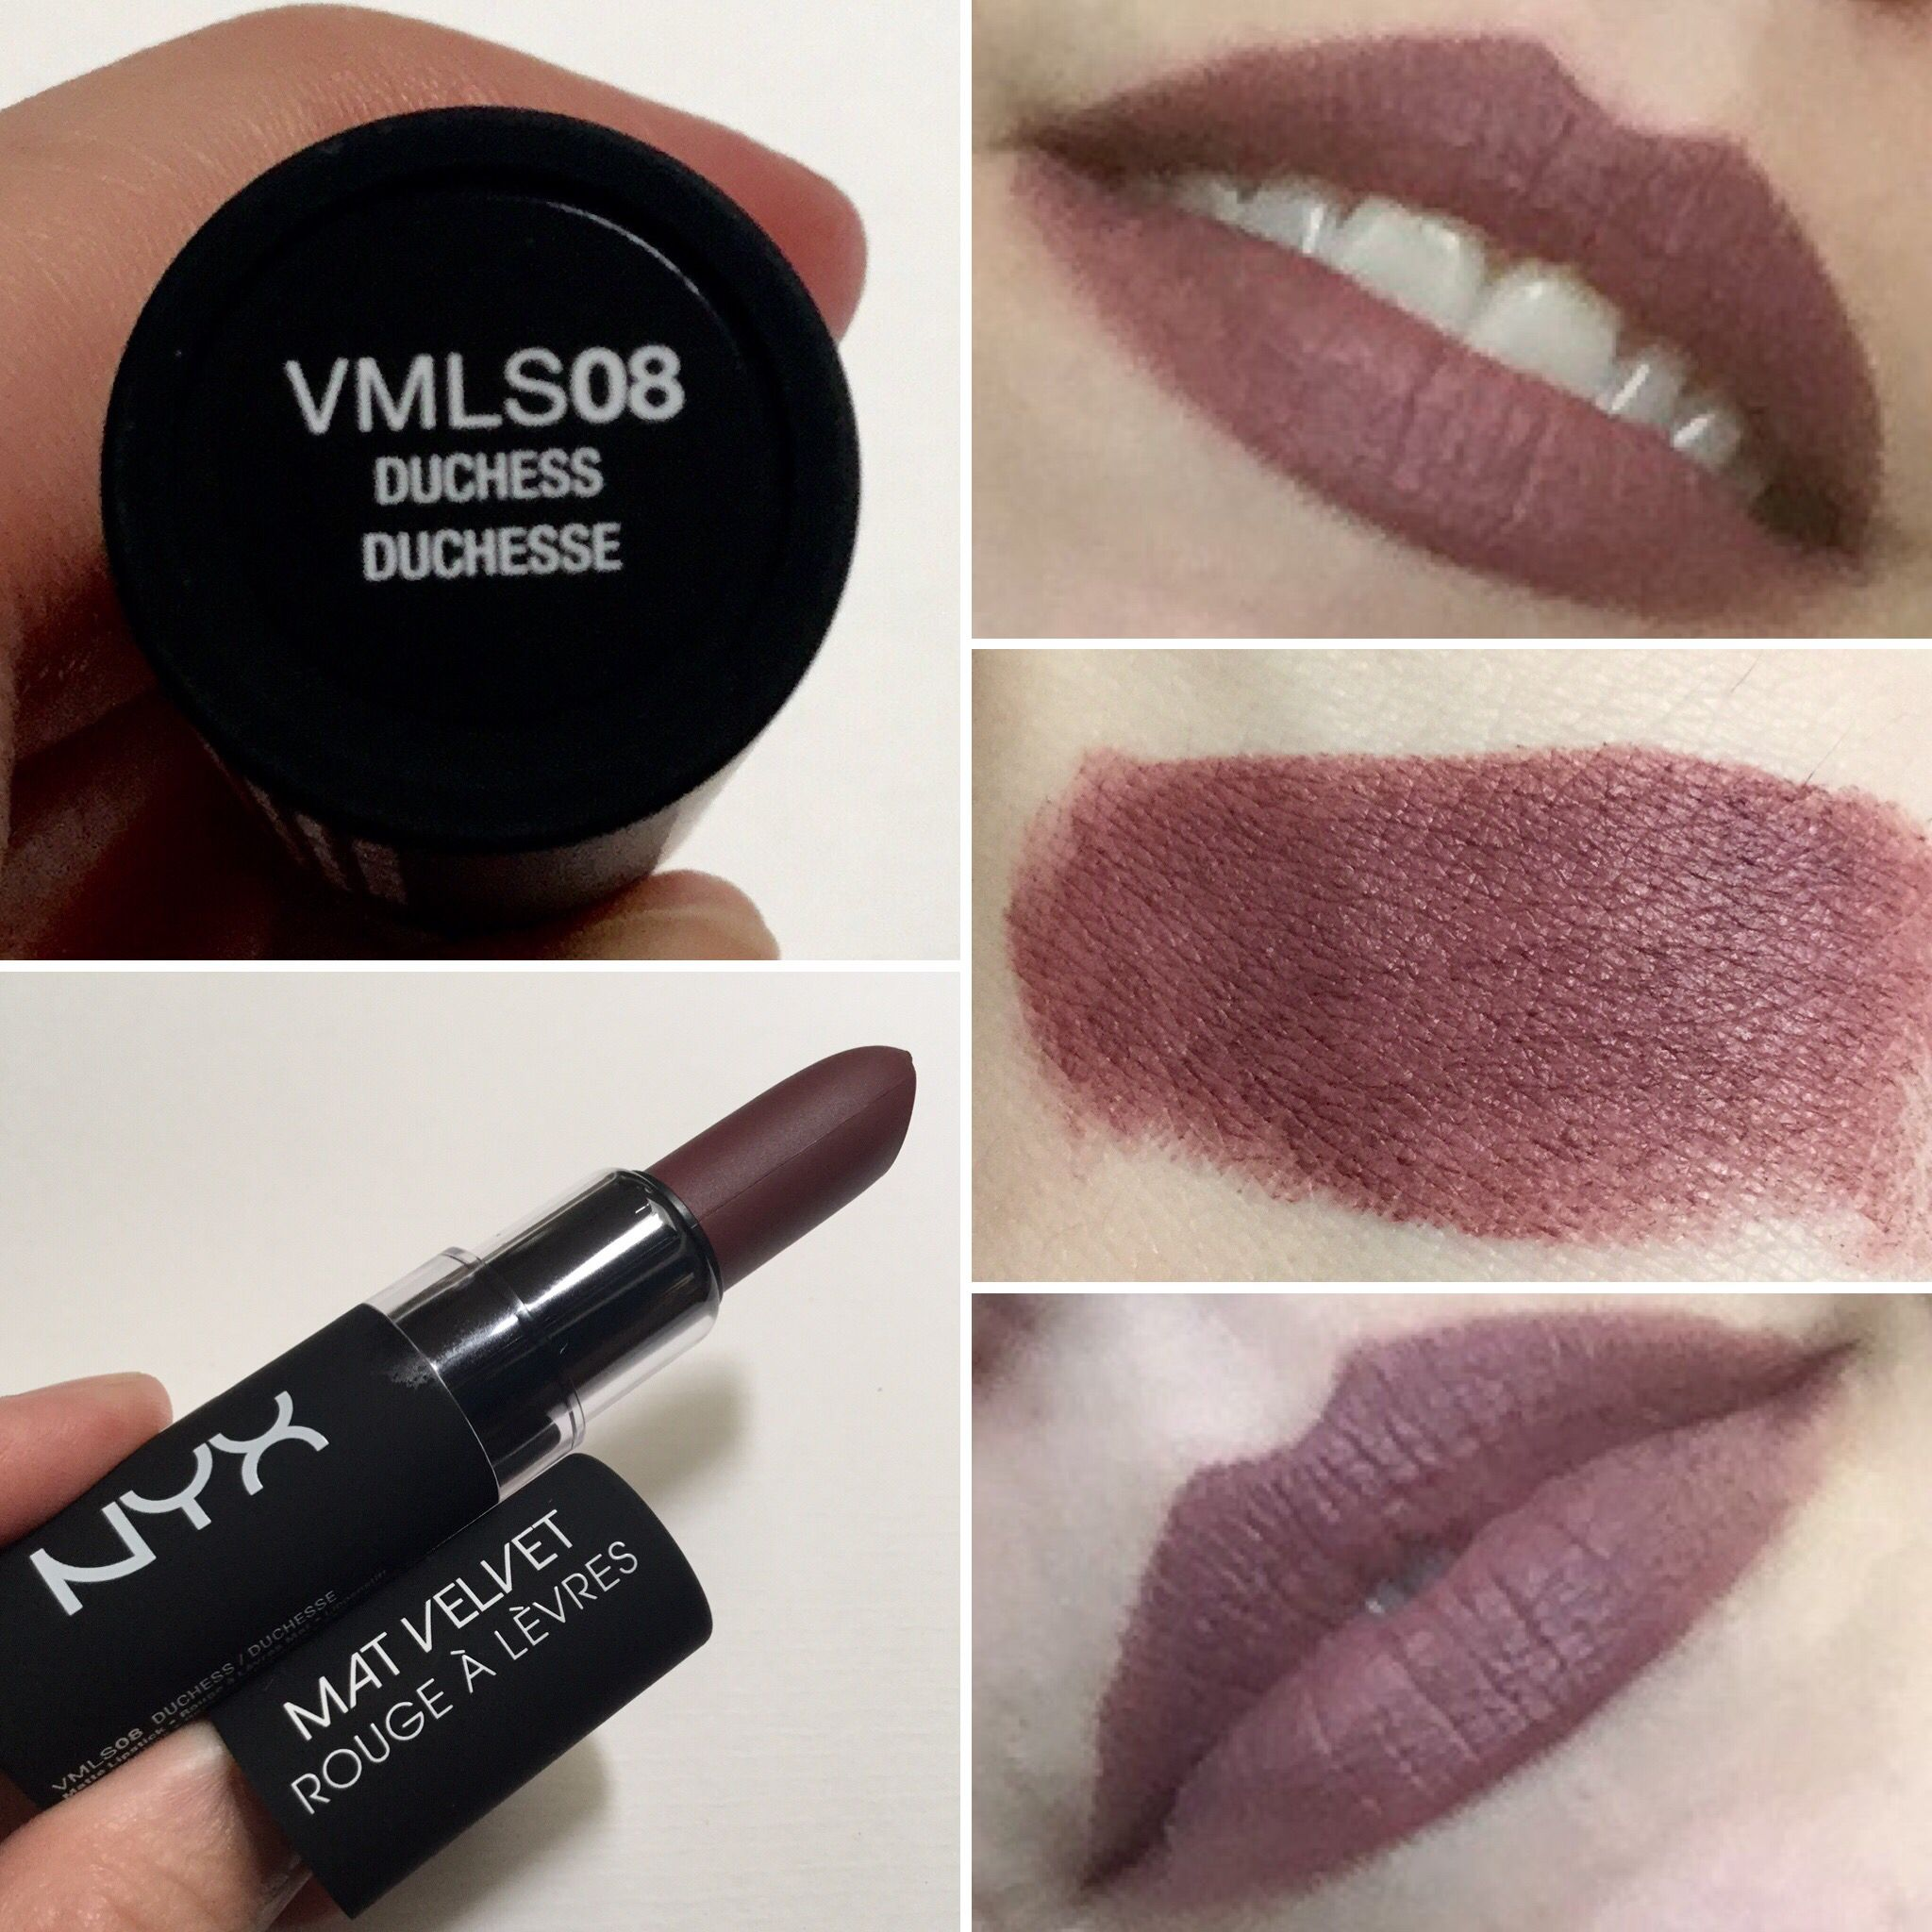 NYX Velvet Matte Lipstick in Duchess. A beautiful dark brown-pink ...